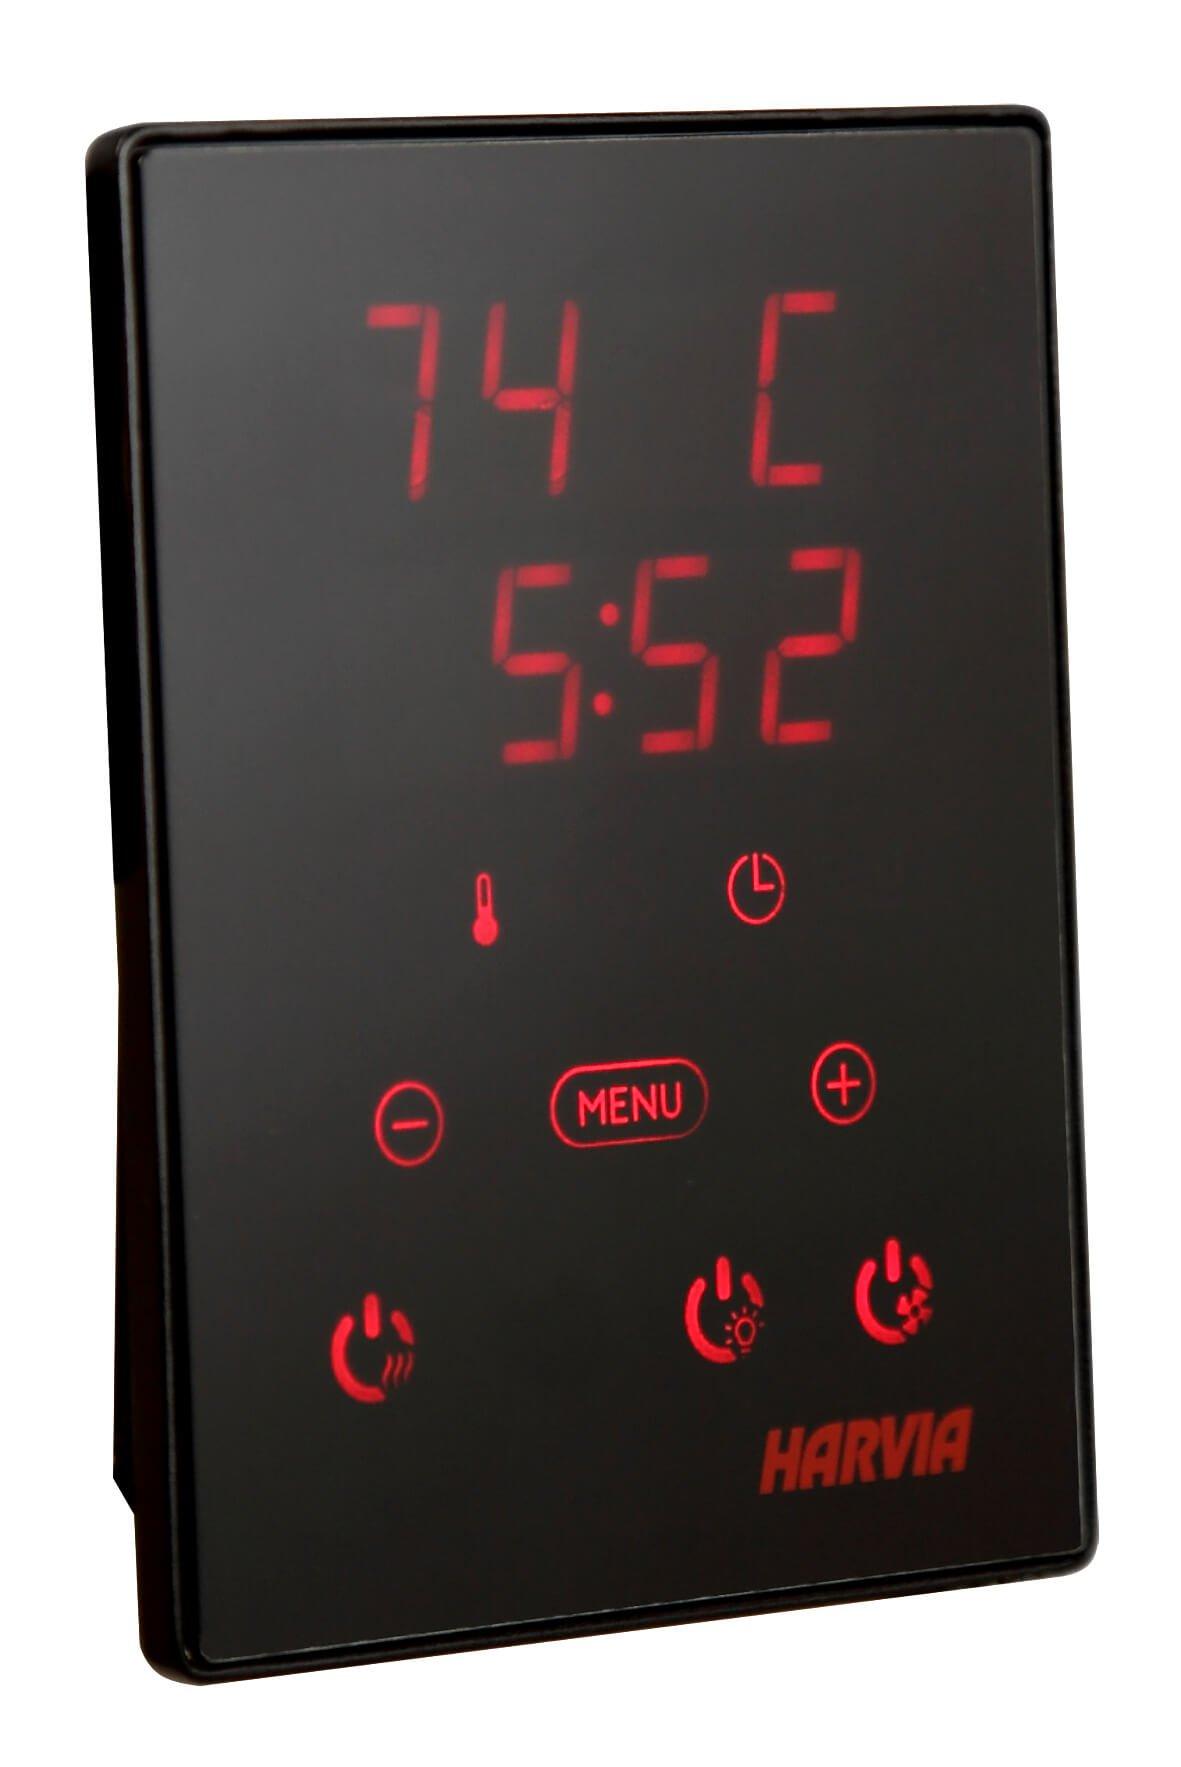 Sterownik HARVIA XENIO CX110 do 11,0kW